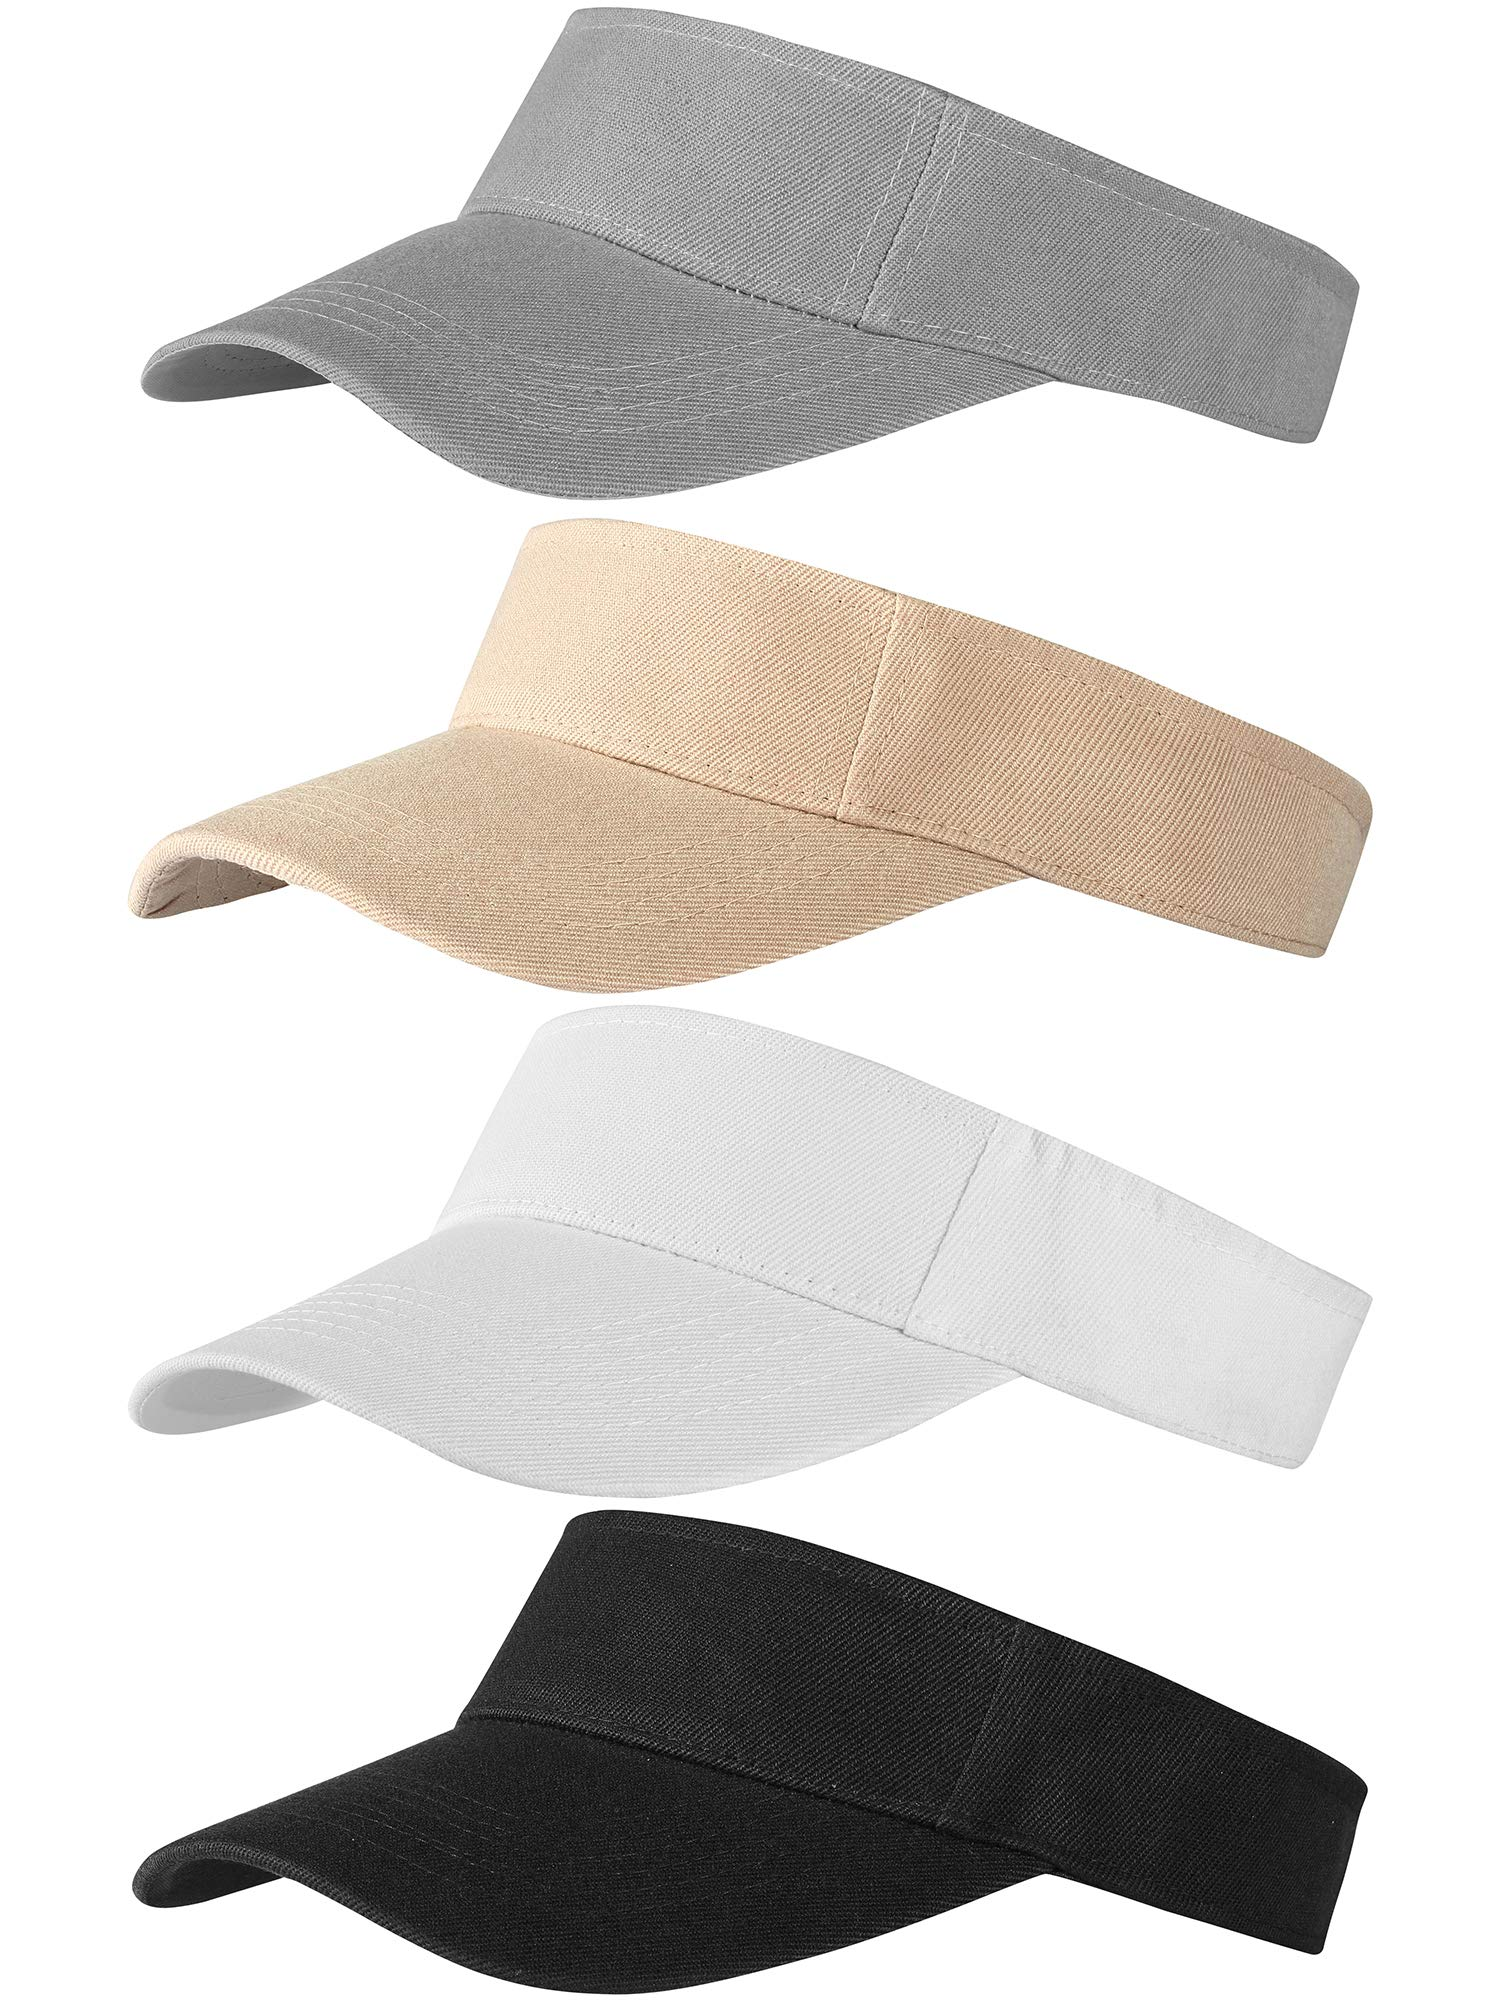 Trounistro 4 Pack Sun Sports Visor Hats Adjustable Hat Summer Cotton Cap